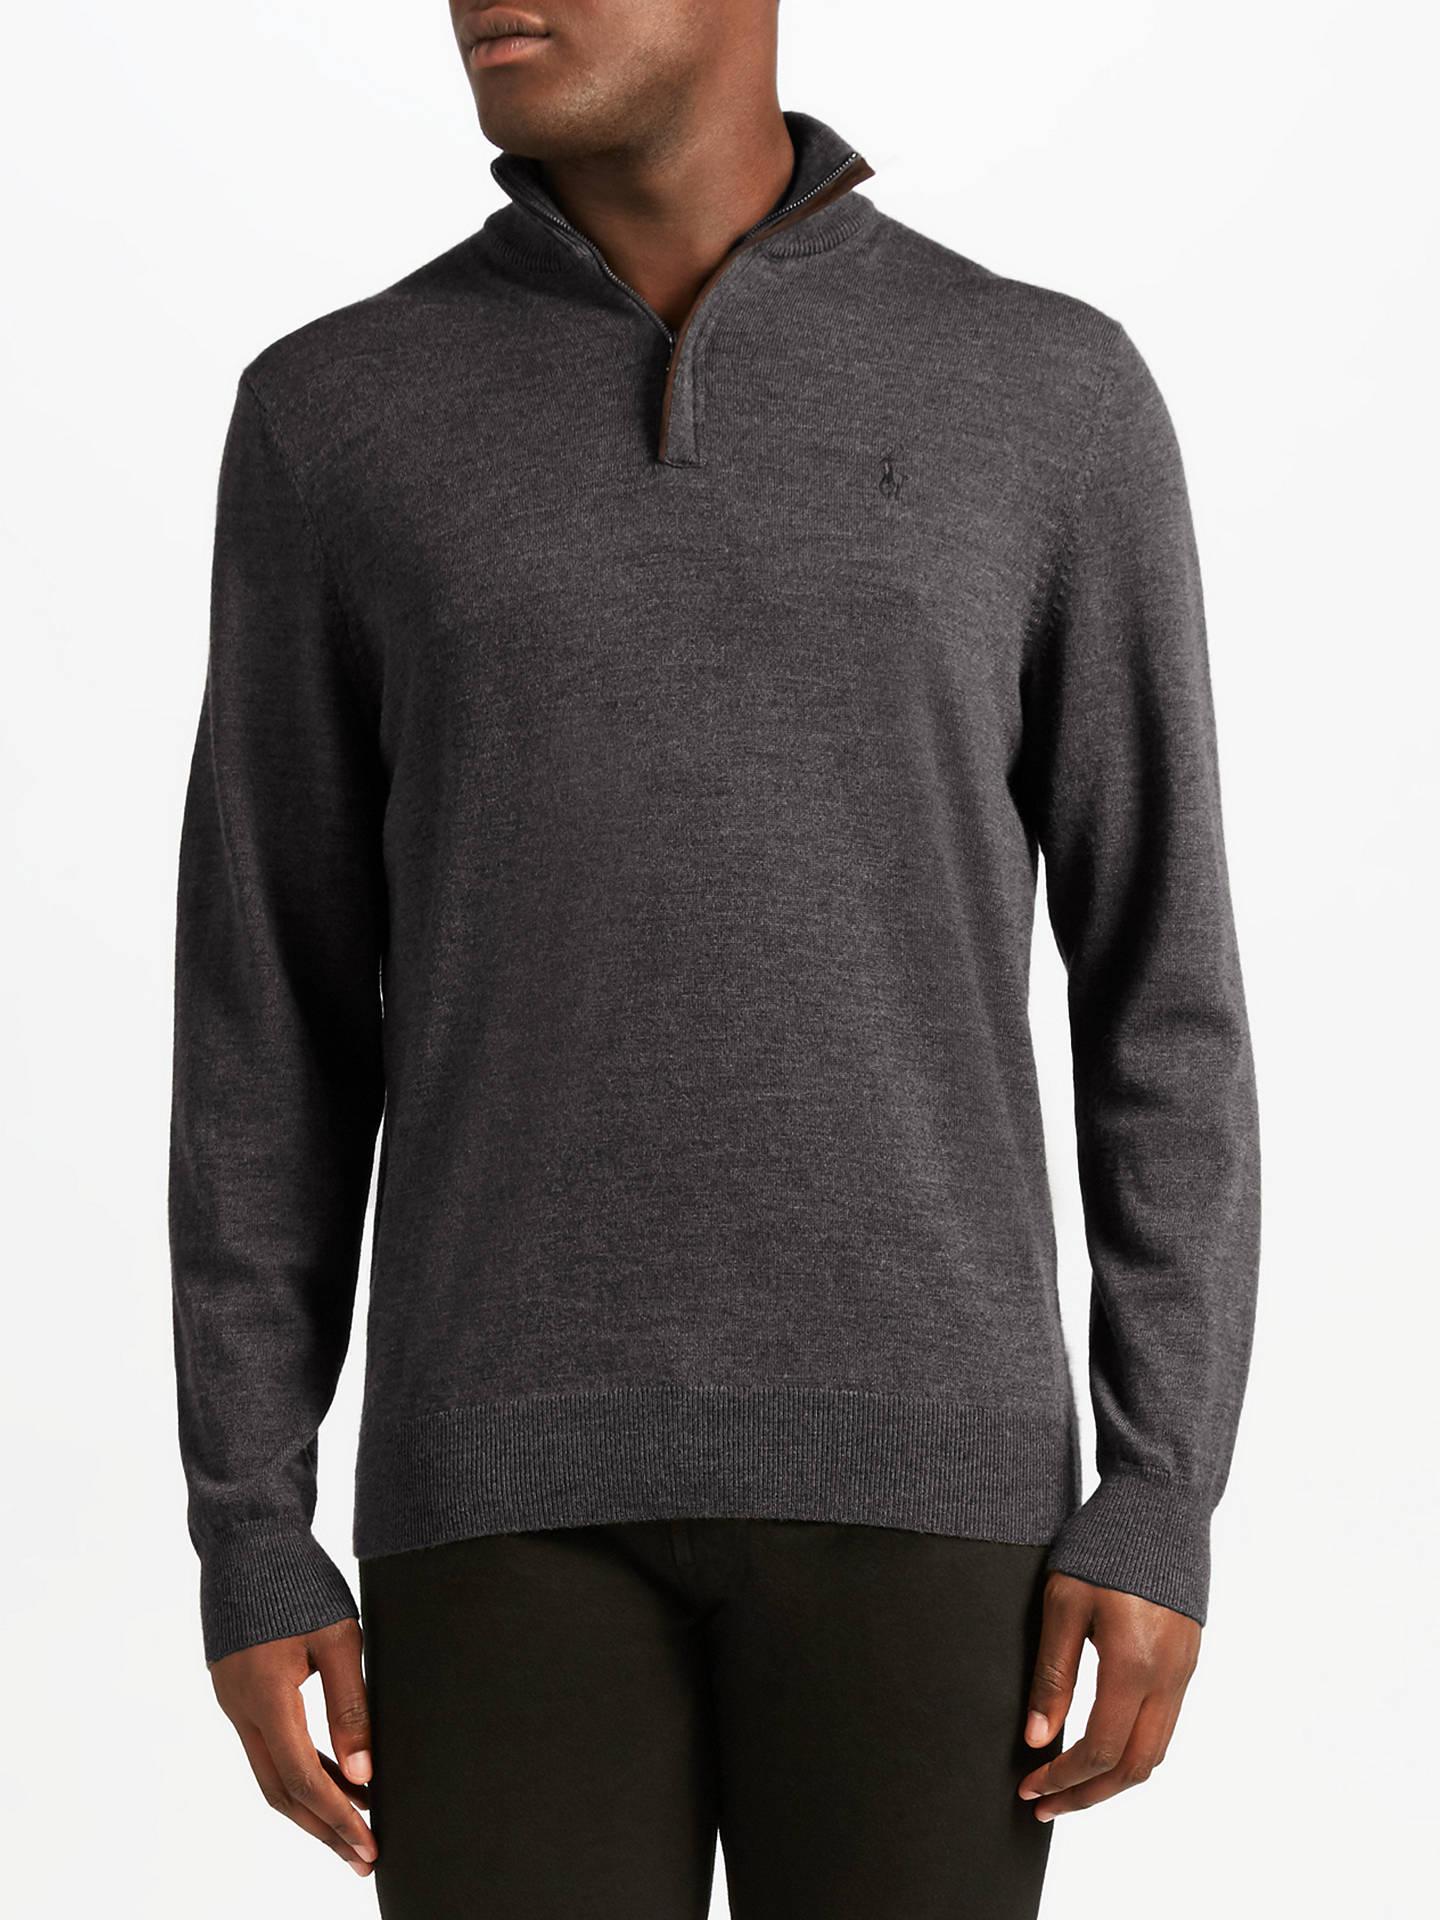 8bfc4f394 Buy Polo Golf by Ralph Lauren Long Sleeve Half Zip Jumper